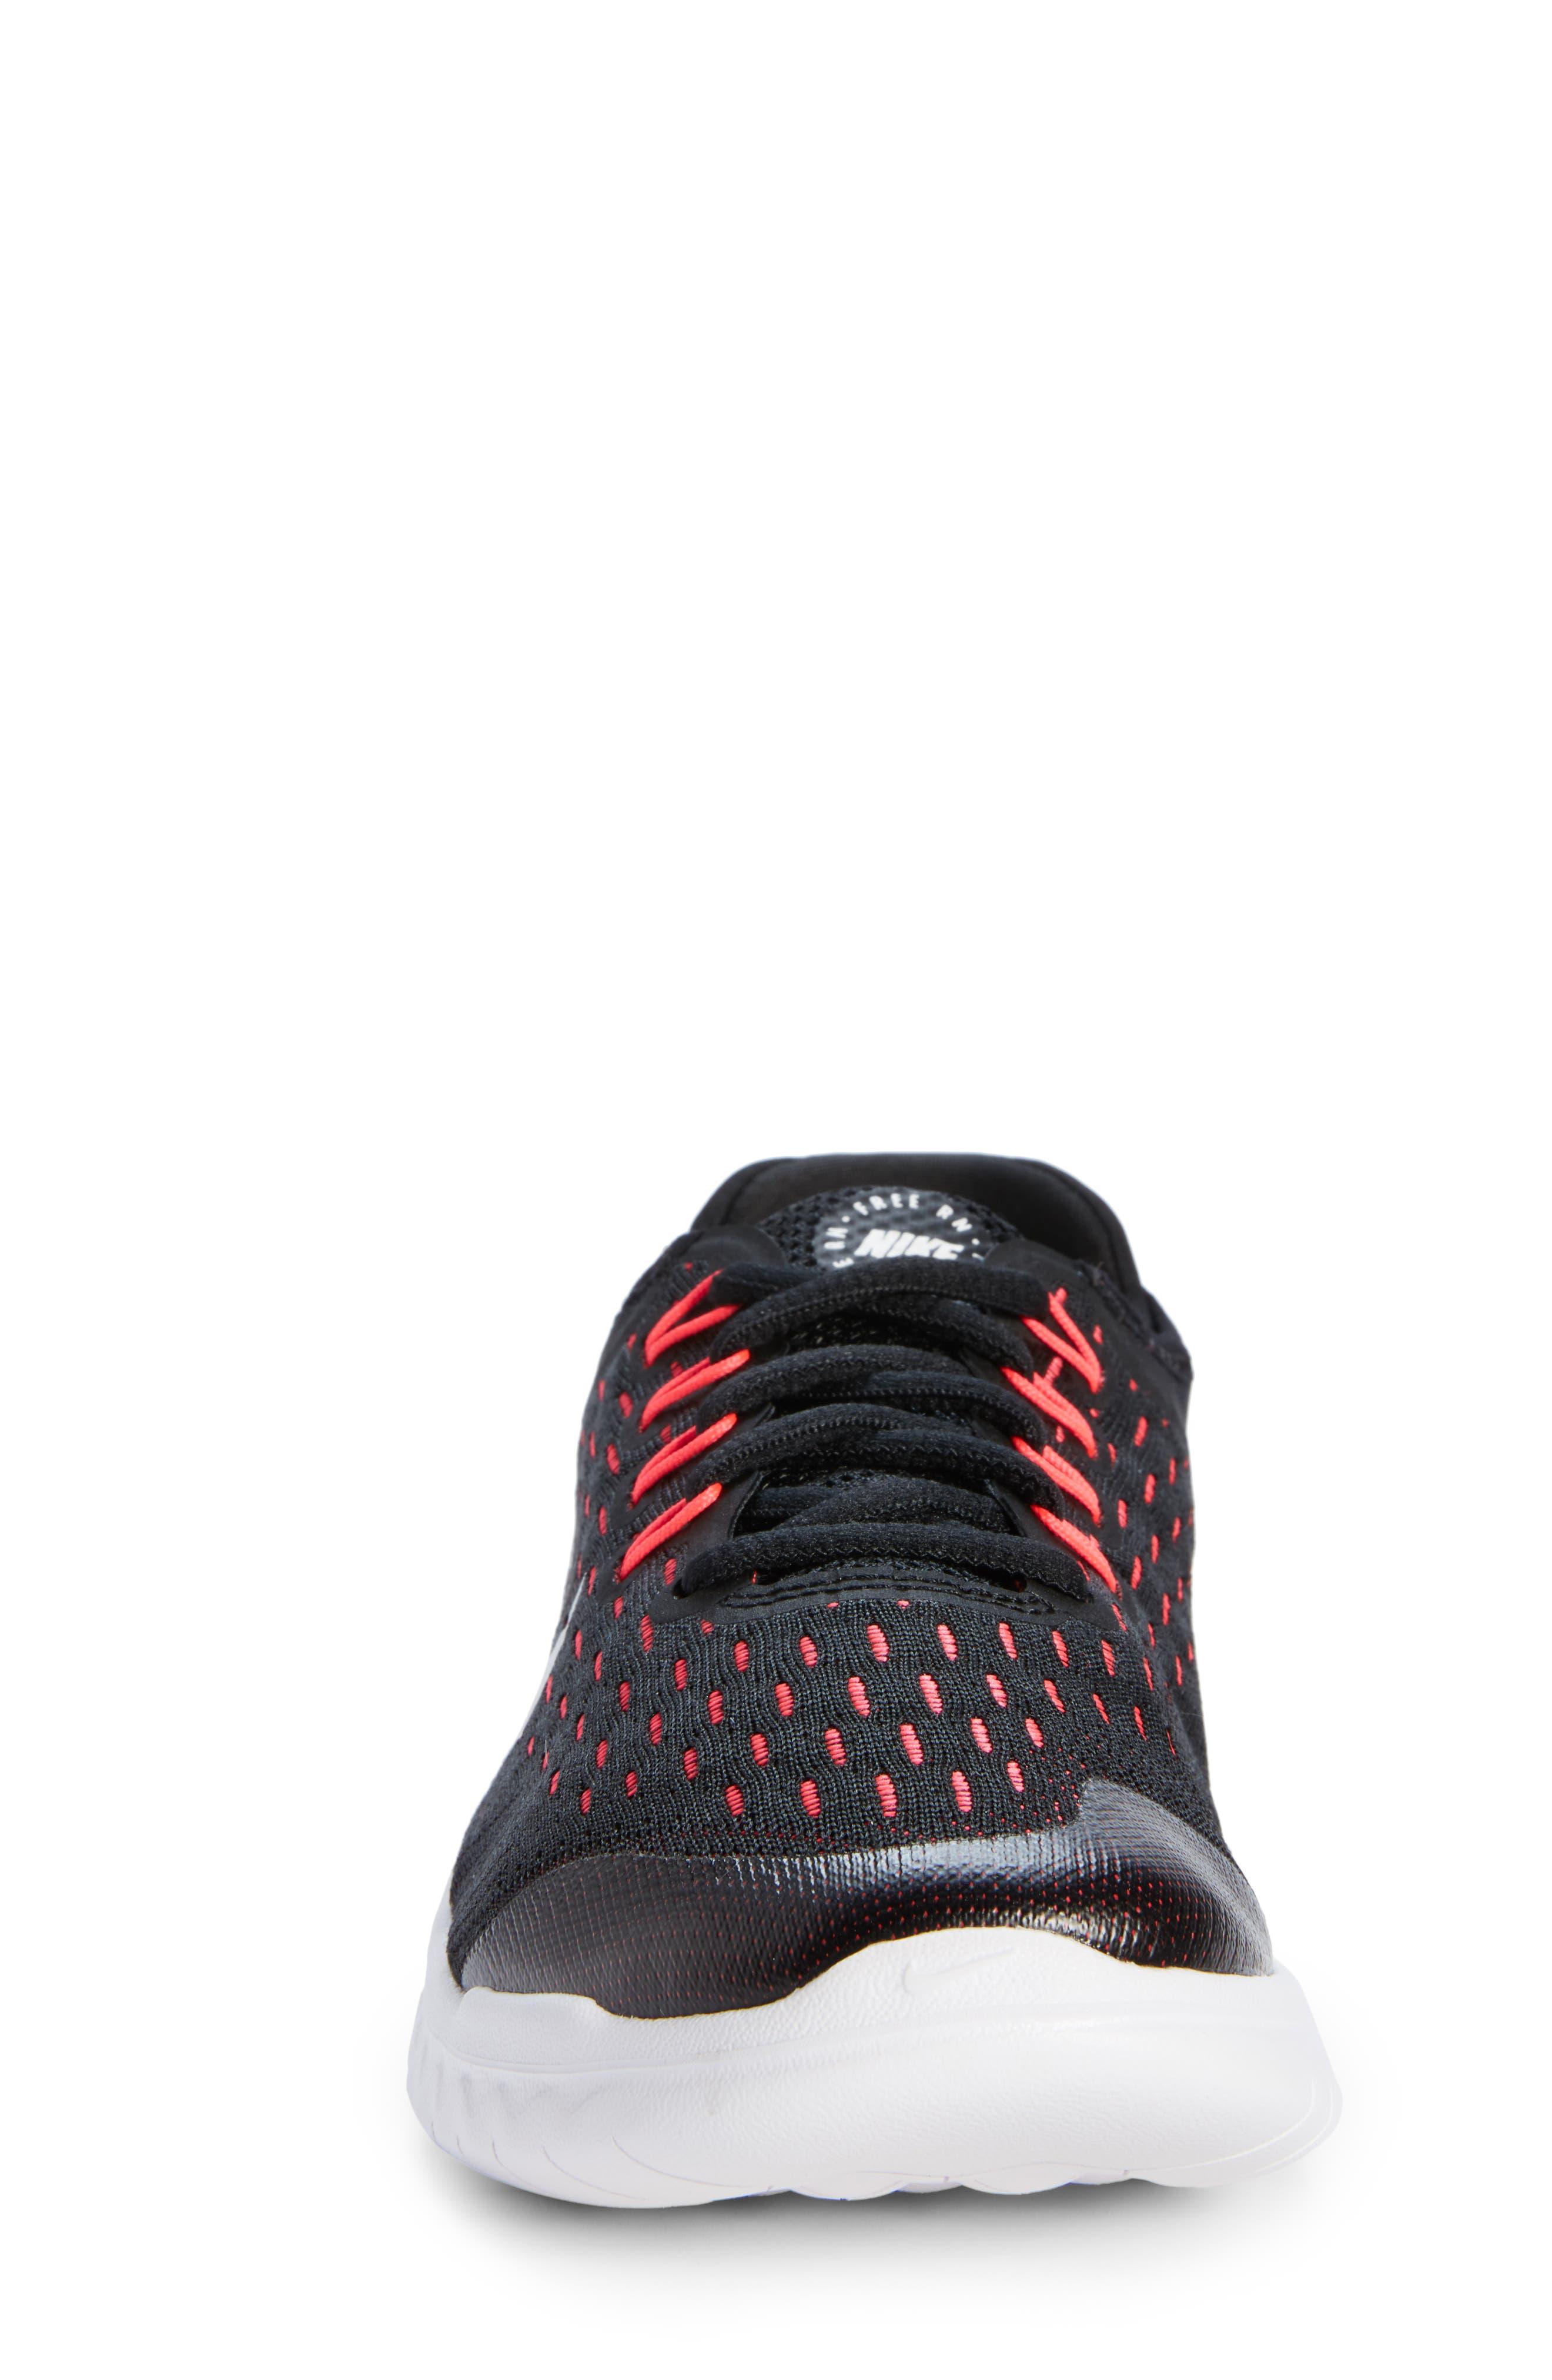 Free RN 2018 Running Shoe,                             Alternate thumbnail 4, color,                             Black/ White/ Pink/ Volt